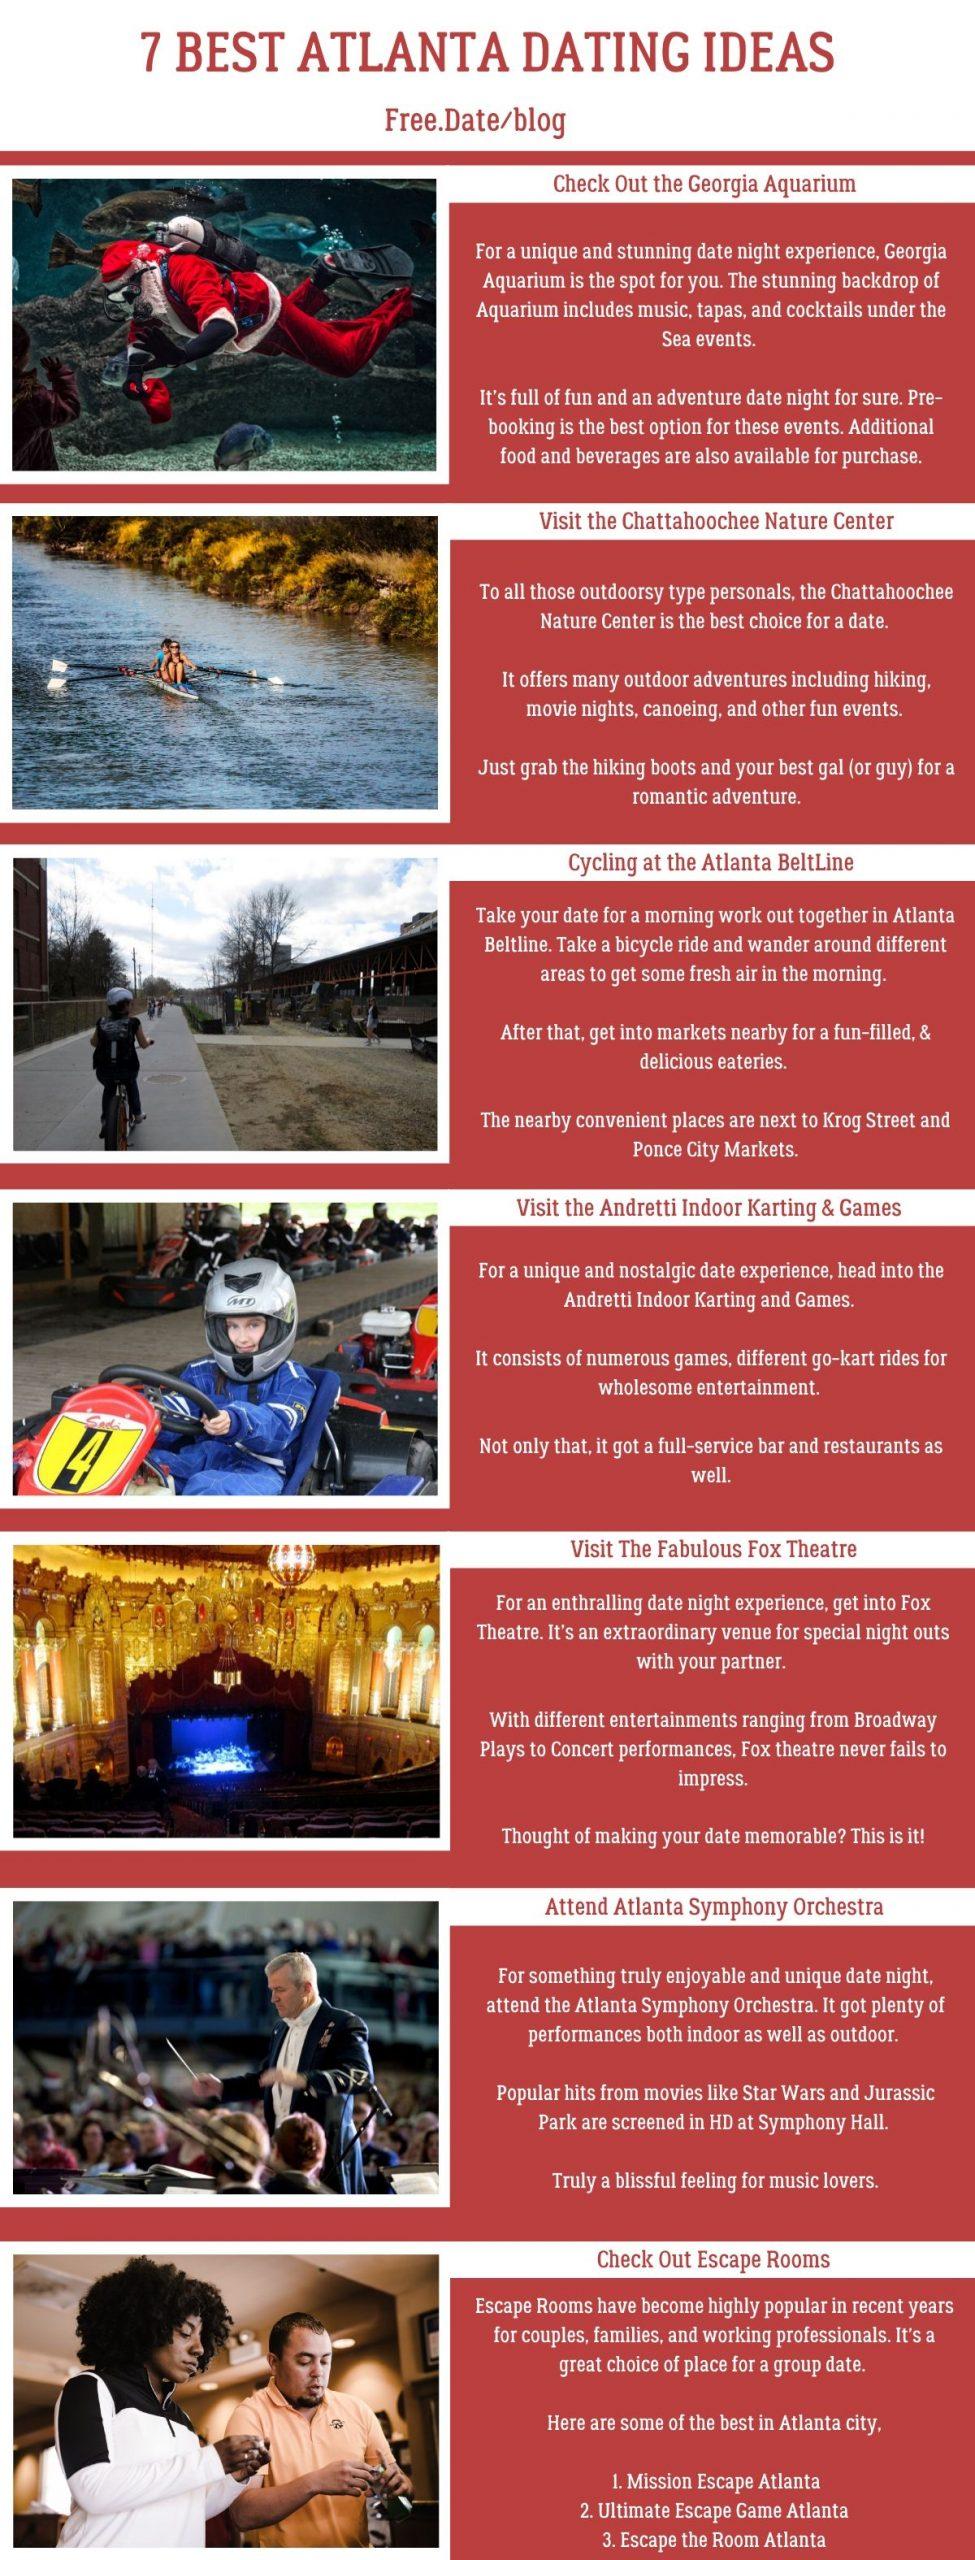 Infographics of 7 Atlanta Dating Ideas - Free Dating Blog